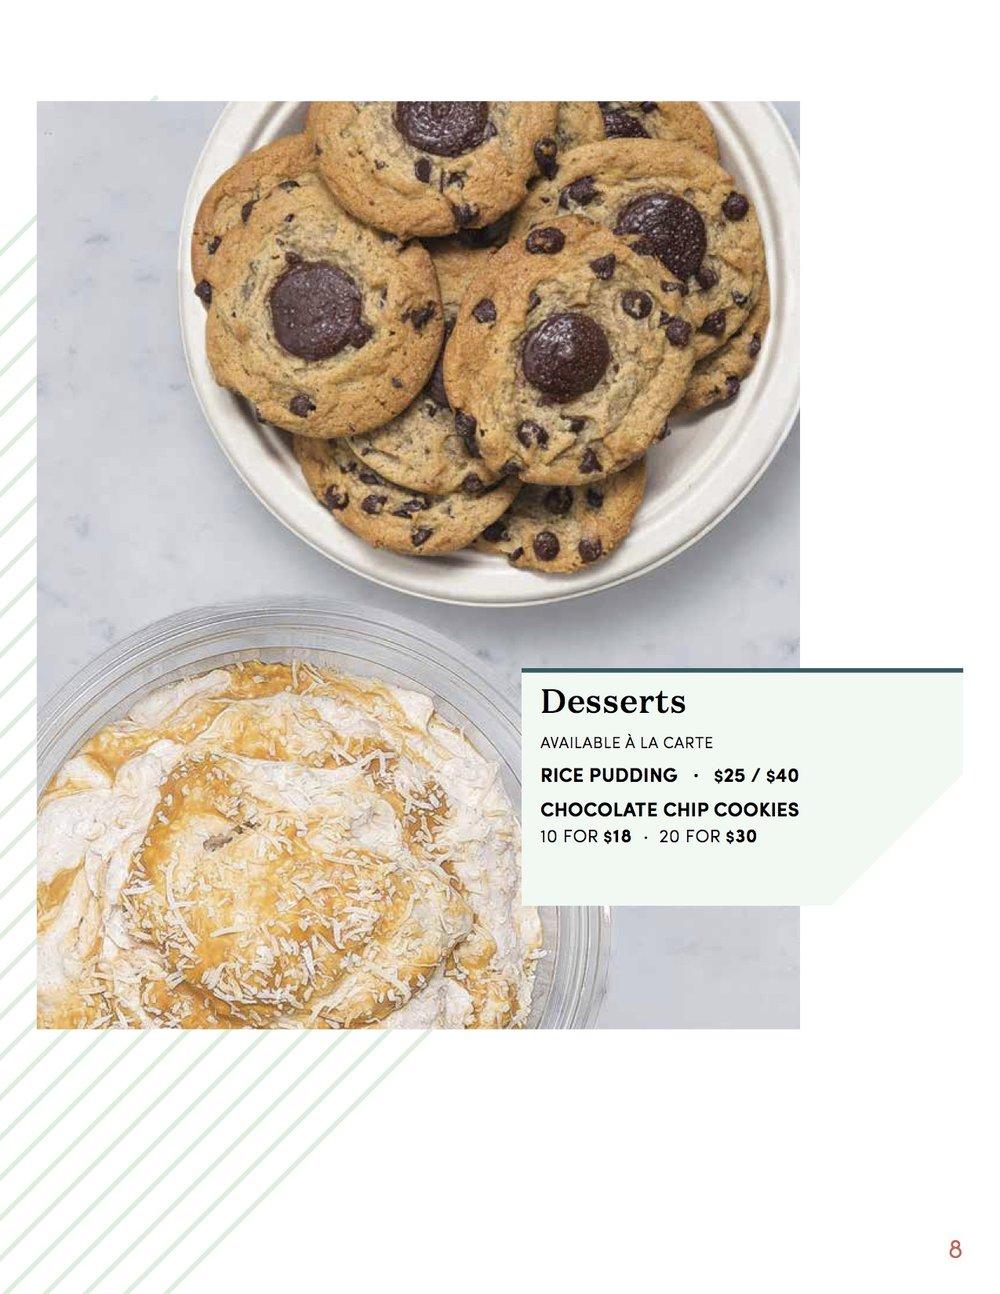 Catering_Menu_8.5x11.dessert.jpg